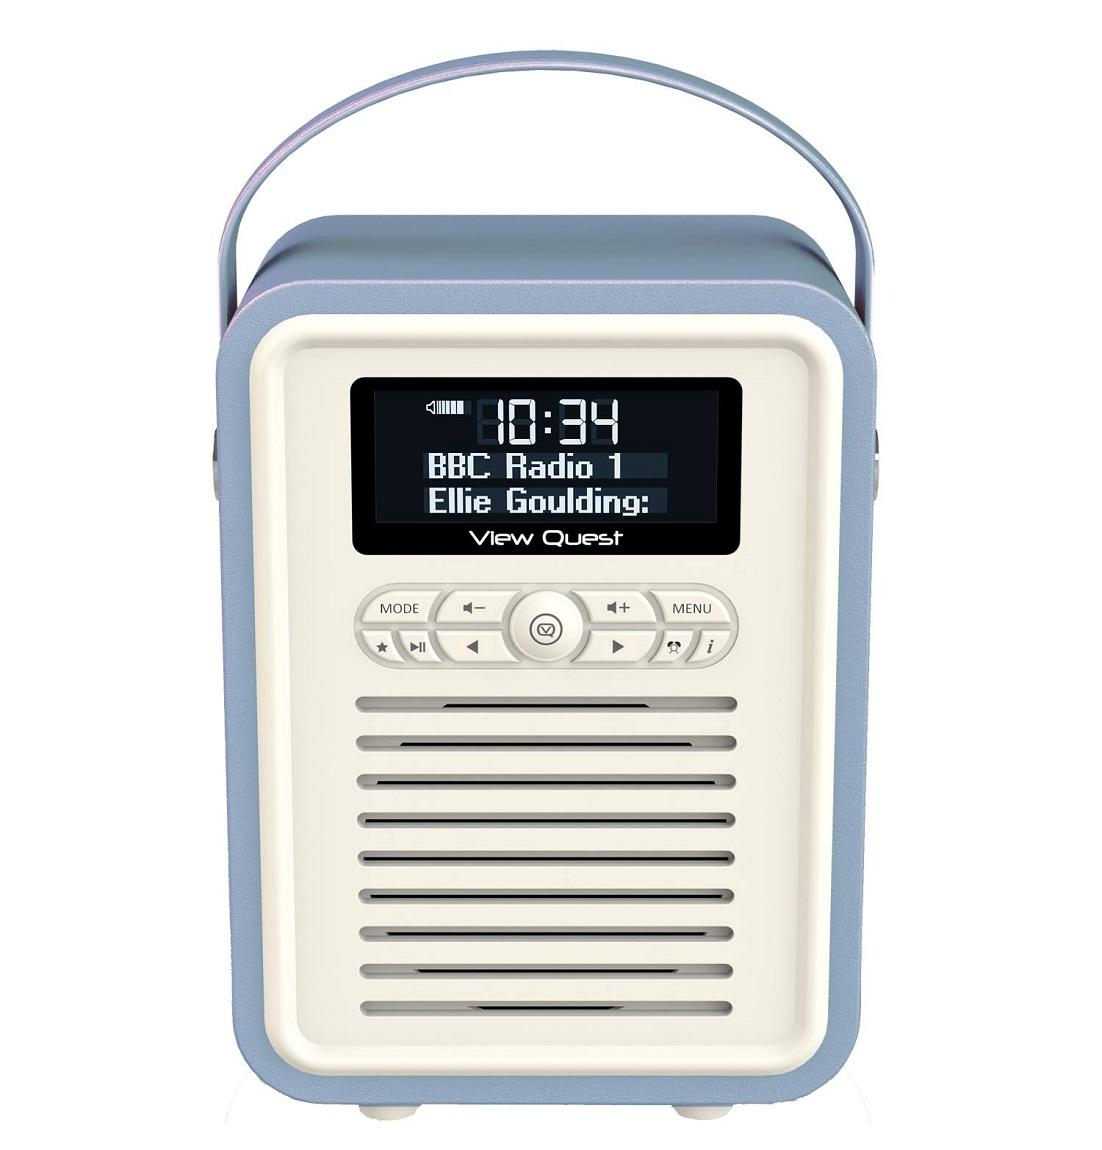 view quest retro mini portable dab fm digital radio built. Black Bedroom Furniture Sets. Home Design Ideas